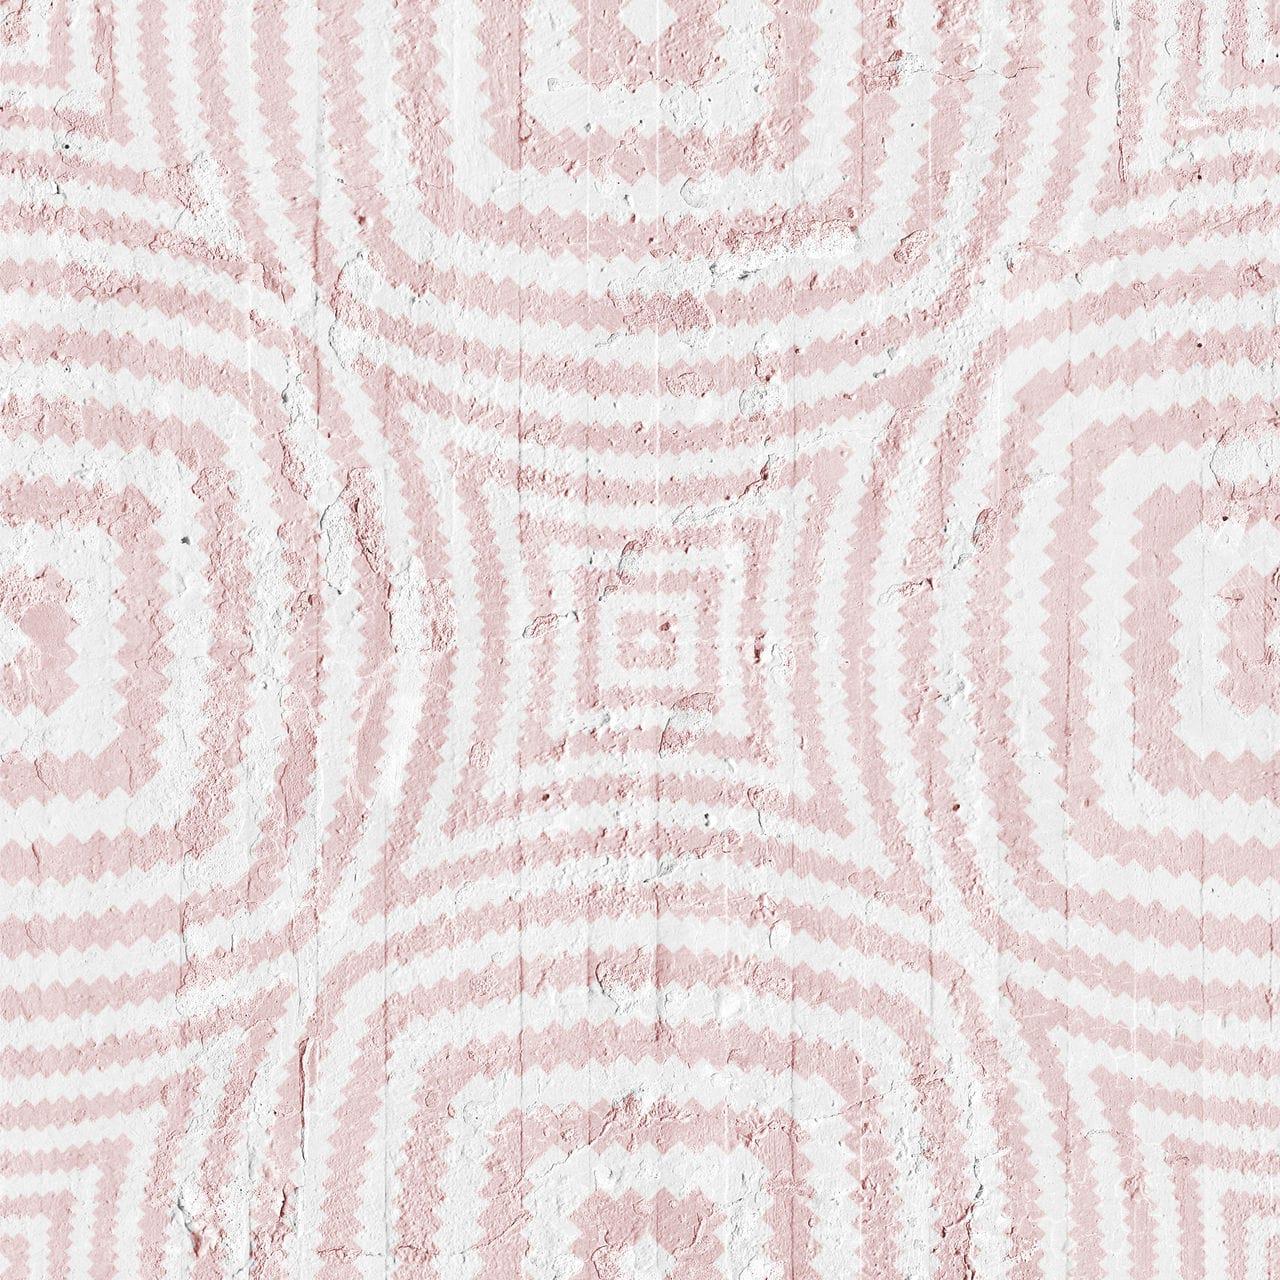 Carta Da Parati Tessuto carta da parati moderna / in tessuto non tessuto / a motivi / aspetto  tessuto